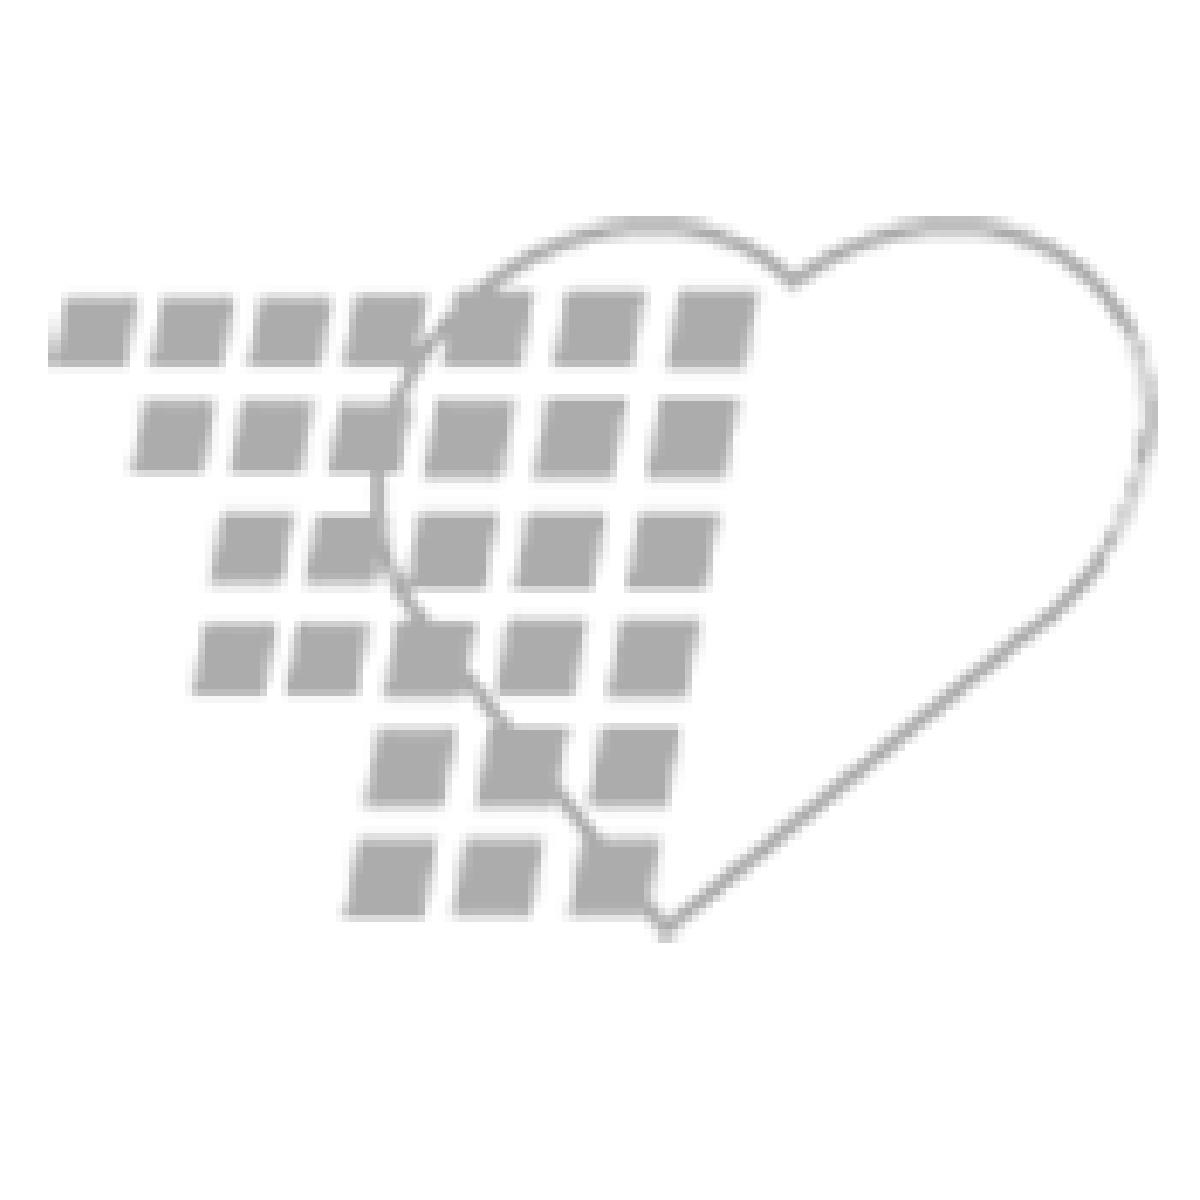 06-93-6937 Demo Dose® Midazolm Versd 10 mg/2 mL (5 mg/mL)